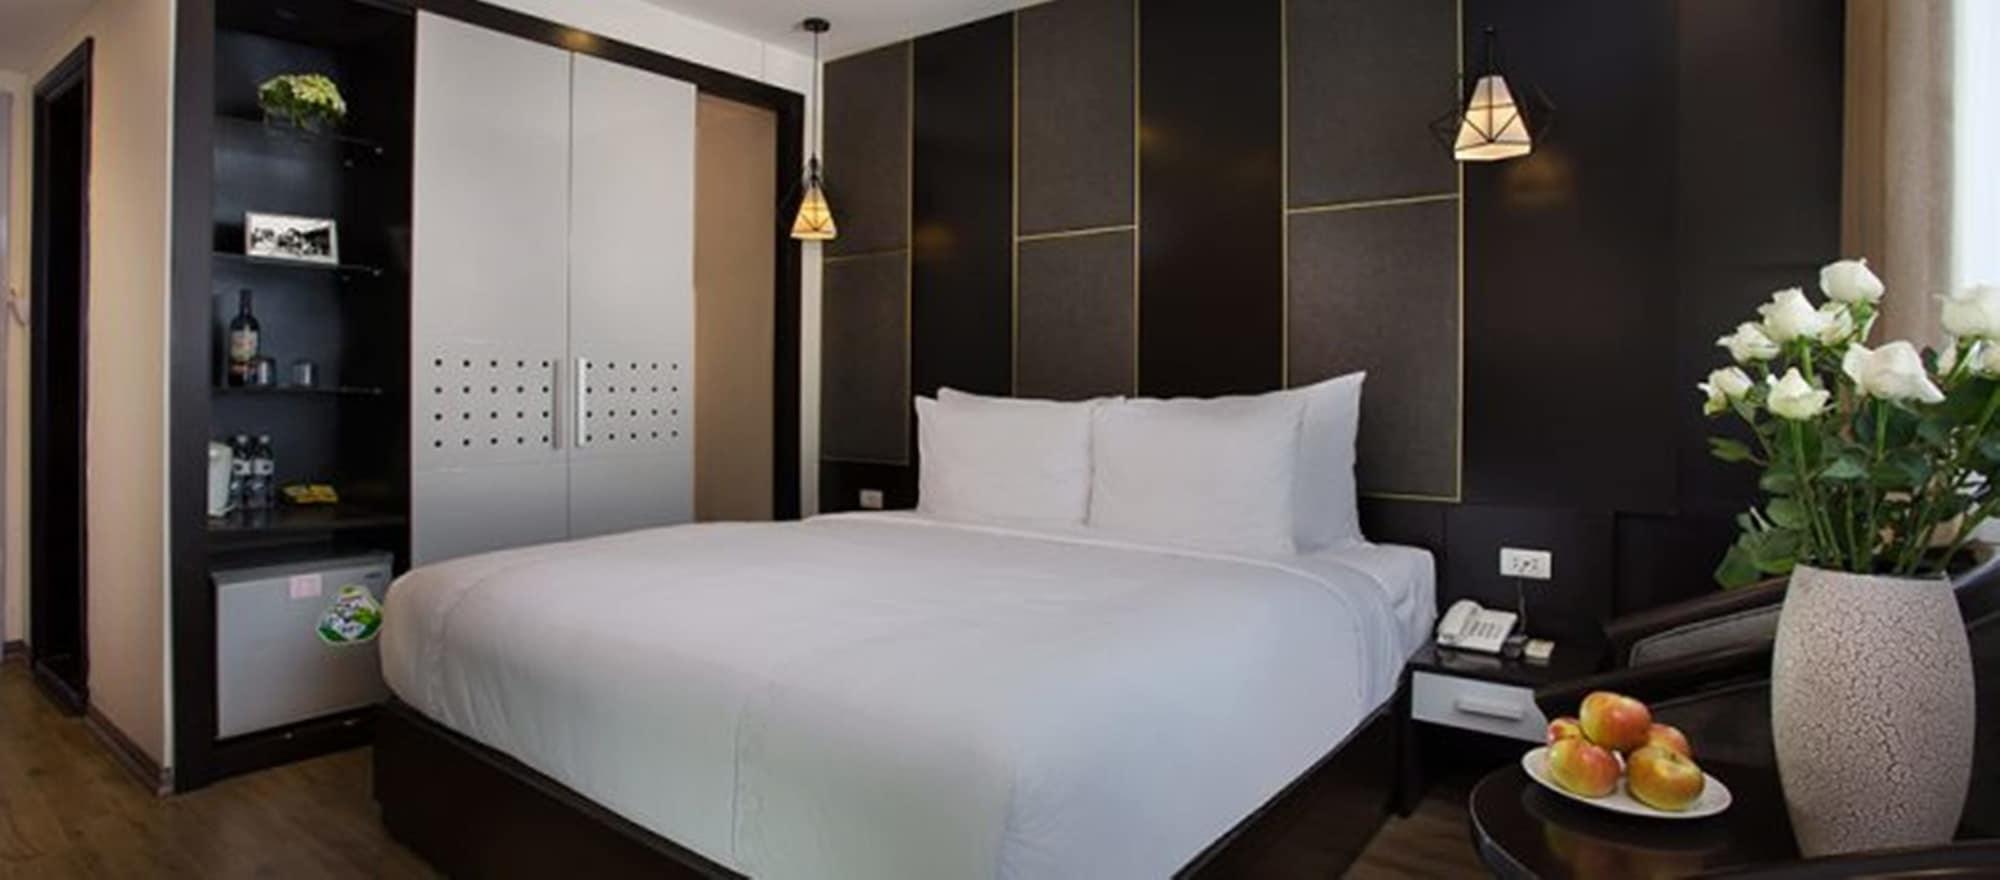 La Santé Hotel & Spa, Ba Đình